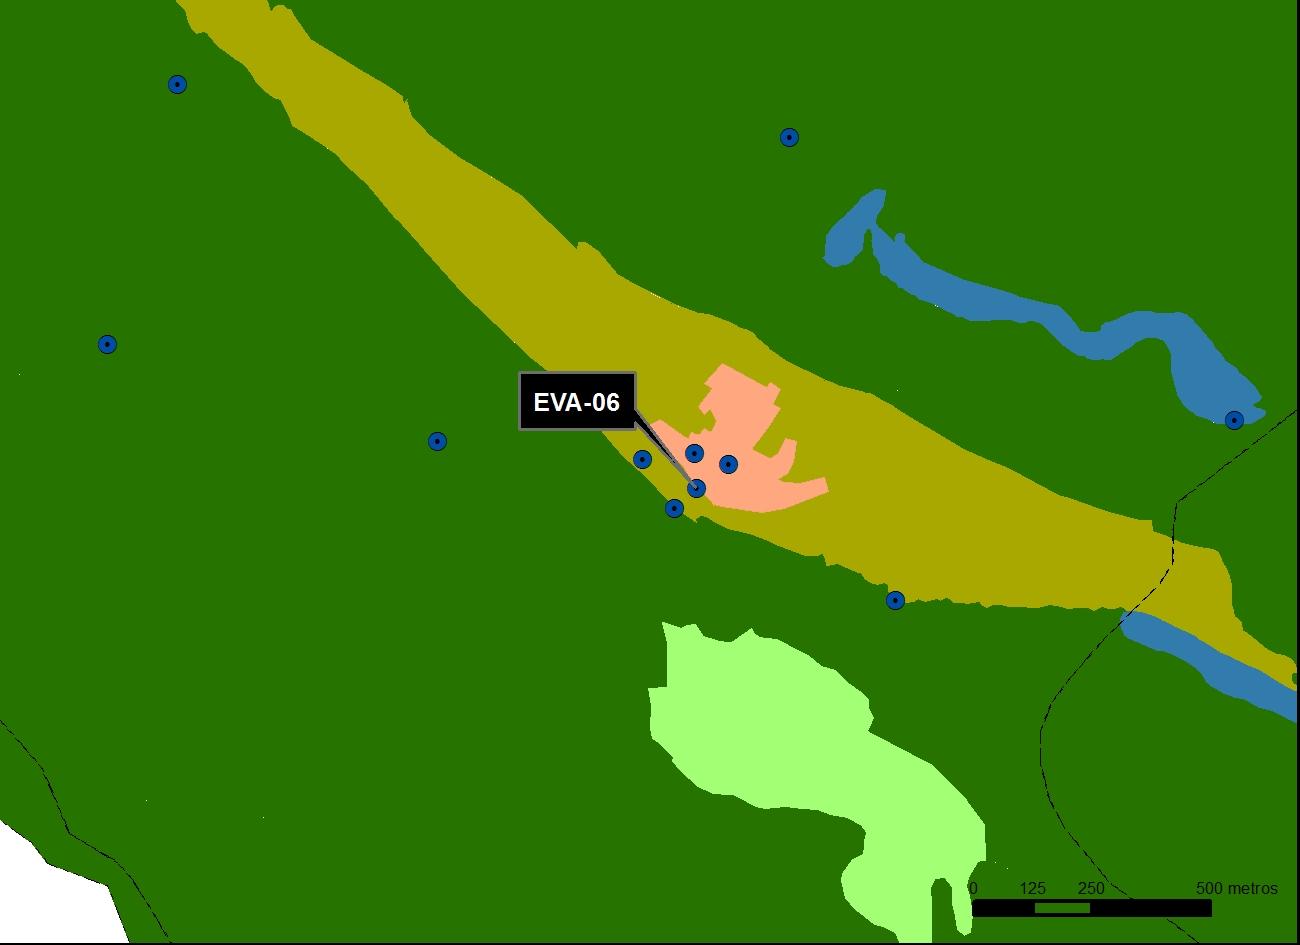 EVA_06_M.V.LOZANO_CARRETERA_MAP.VEG